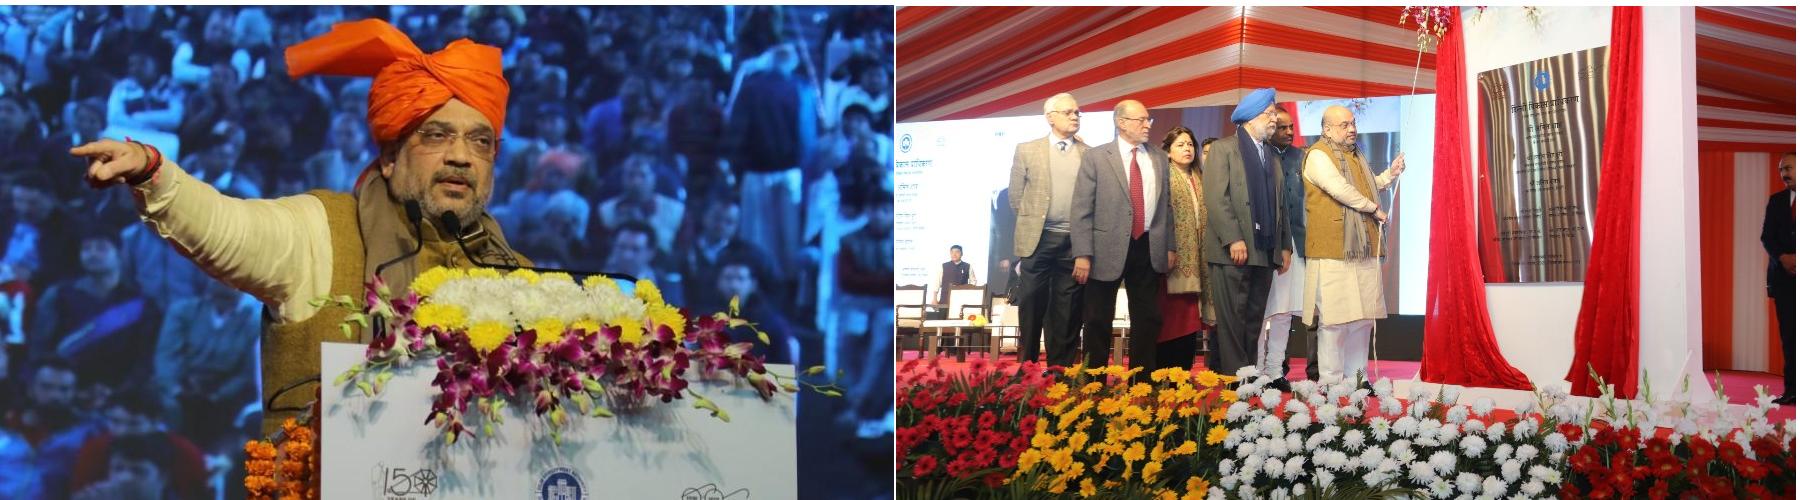 Union Minister for Home Affairs, Shri Amit Shah laid foundation stone of The Delhi CycleWalk at Tughlakabad, New Delhi , on January 6, 2020.